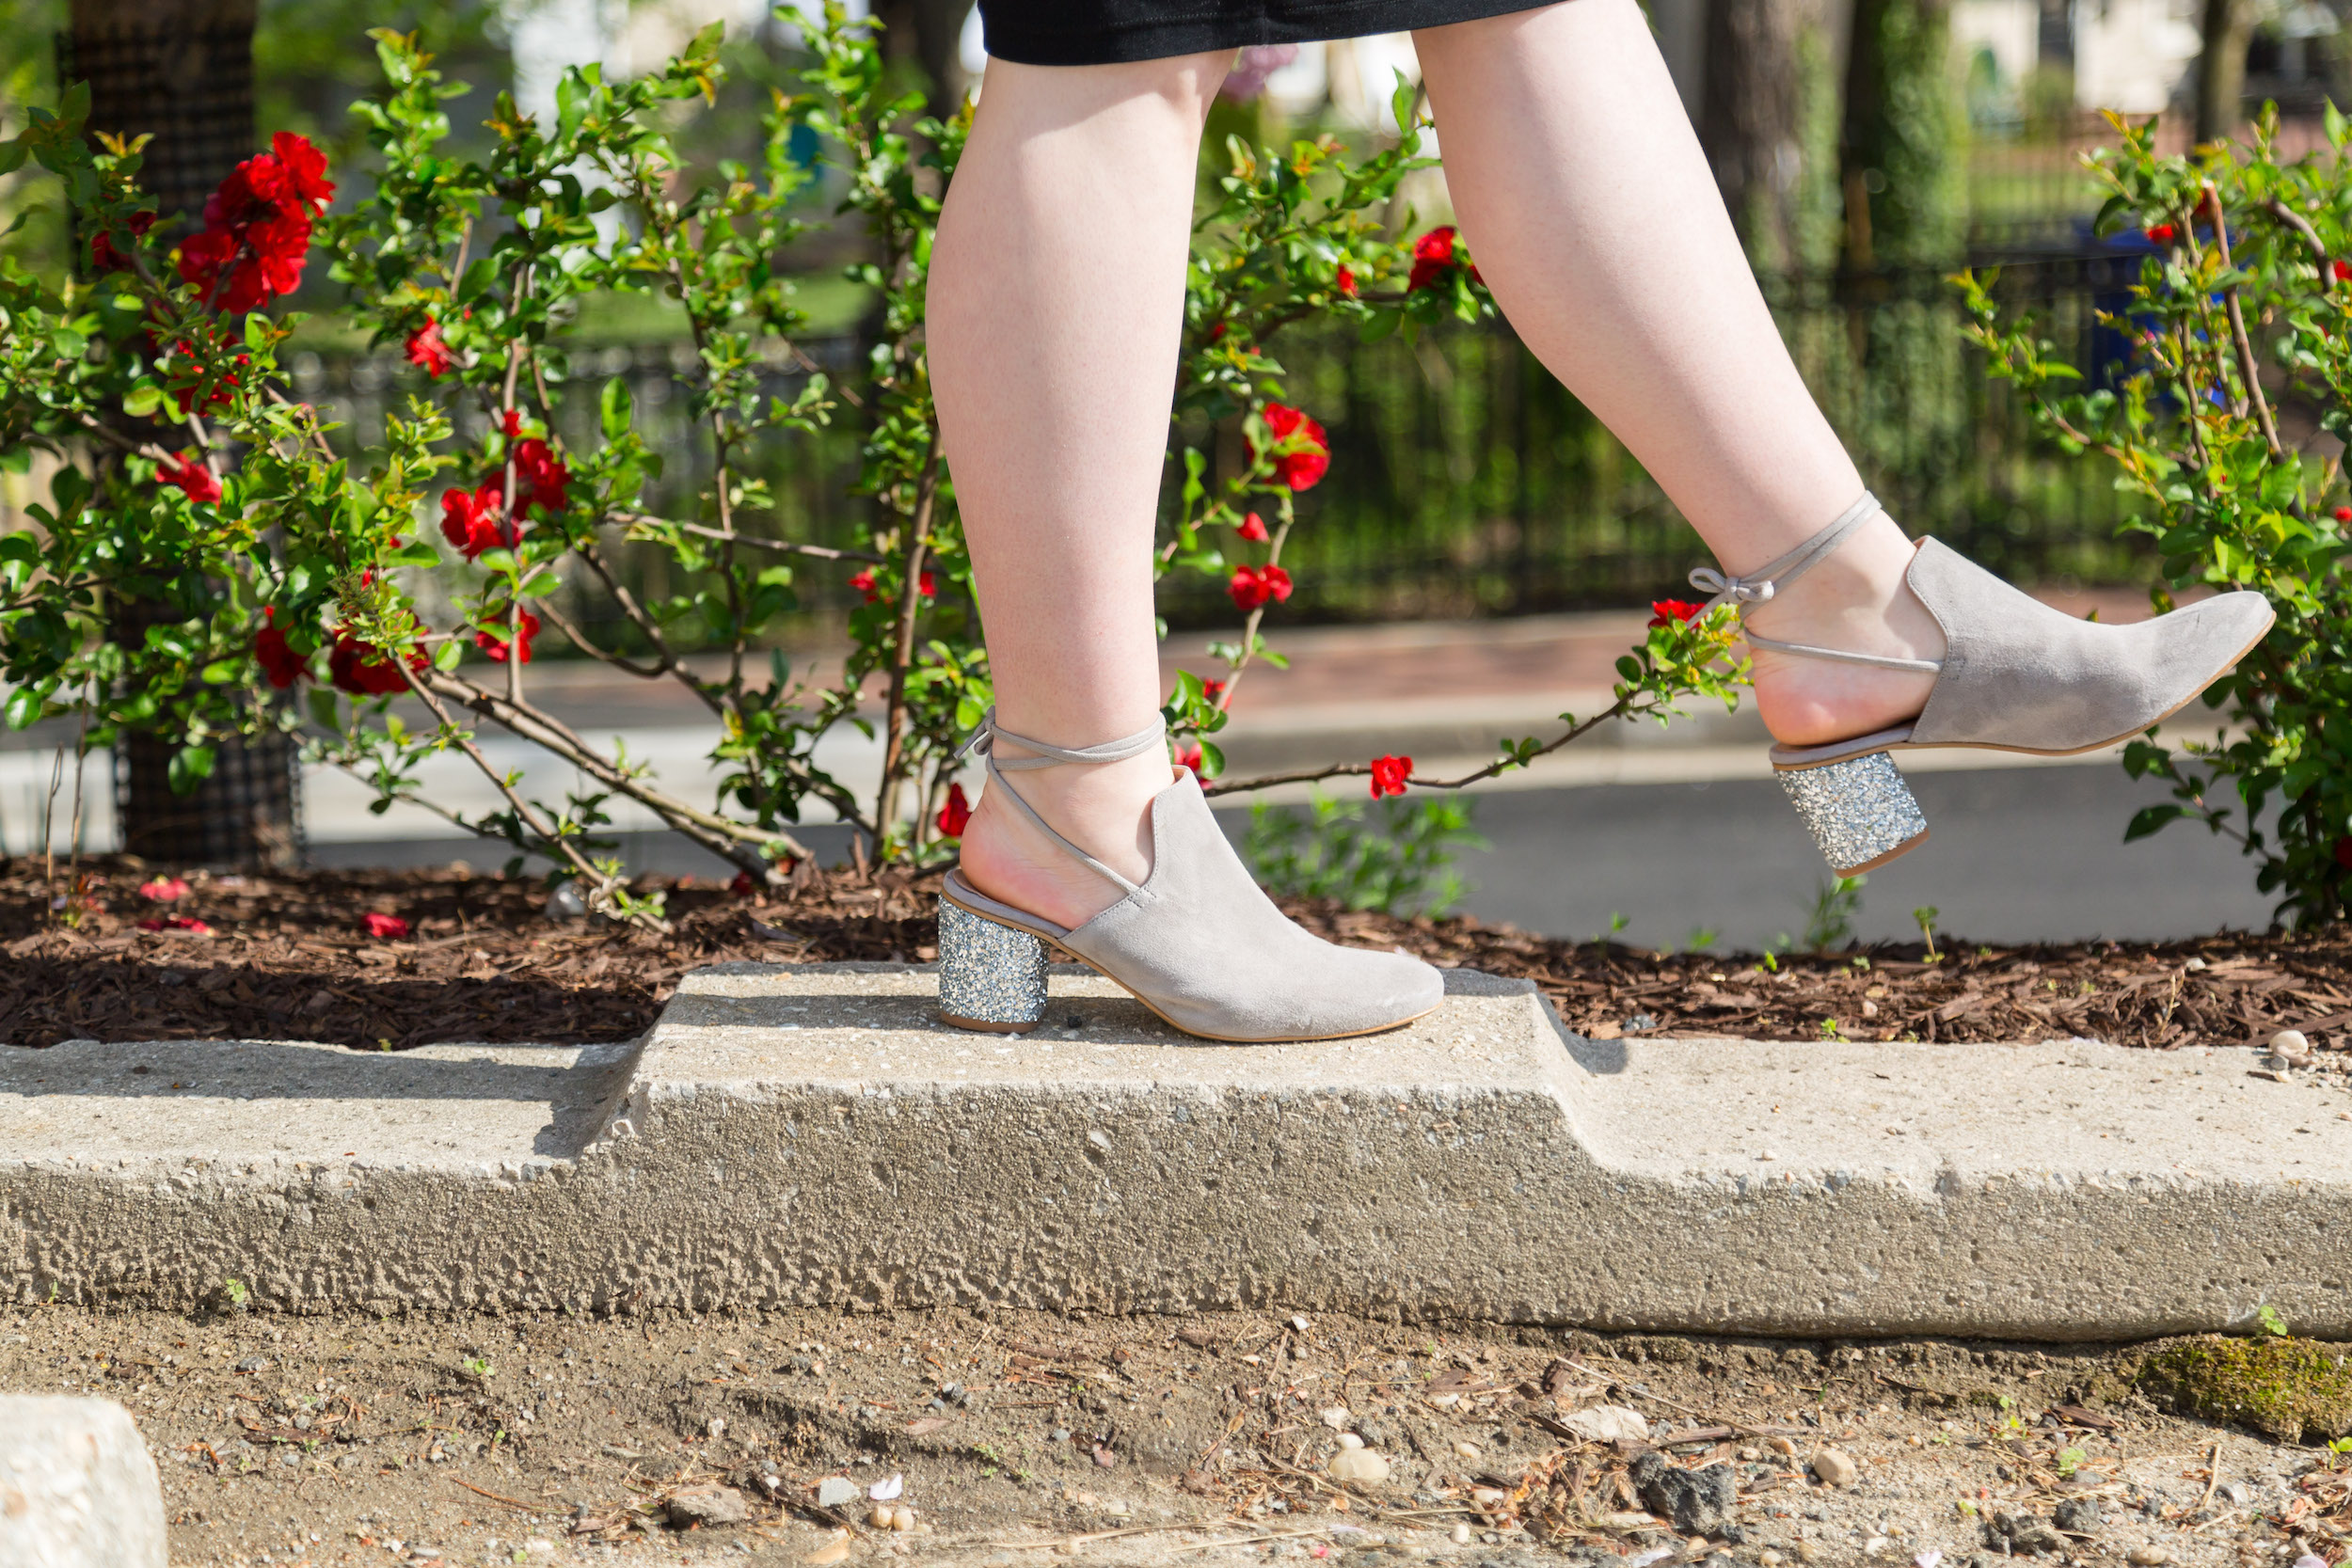 accesorizing the bump cute shoes | bysarahrae.com